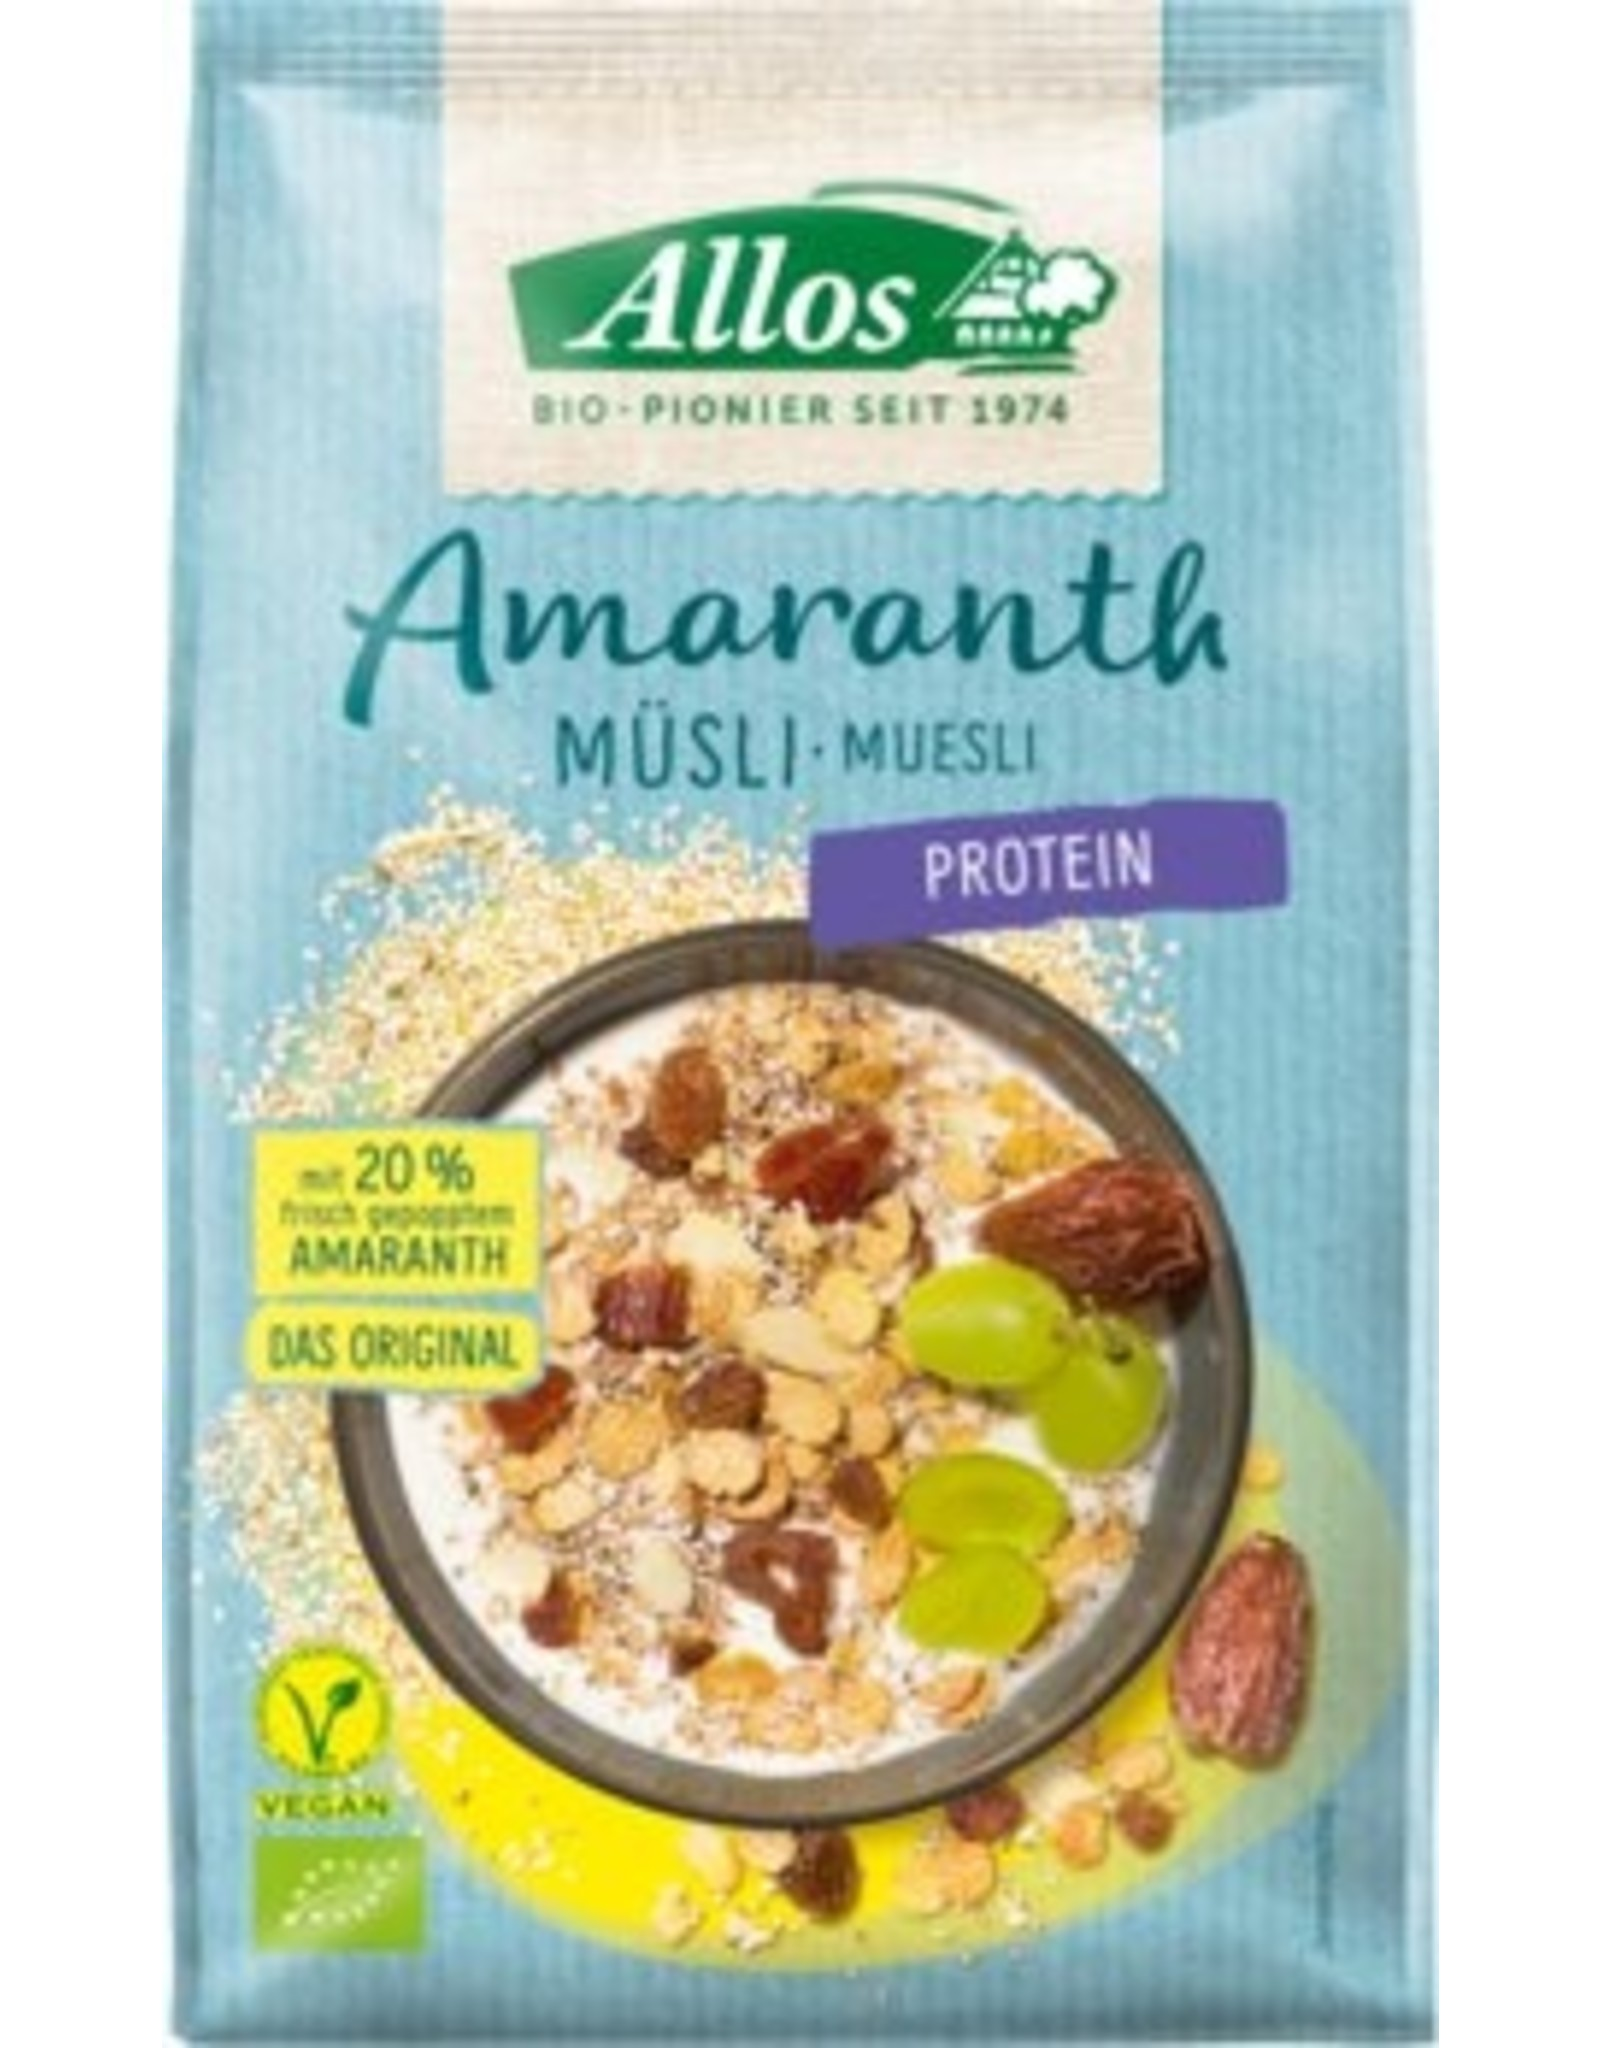 Allos Amaranth Protein Müsli 375g